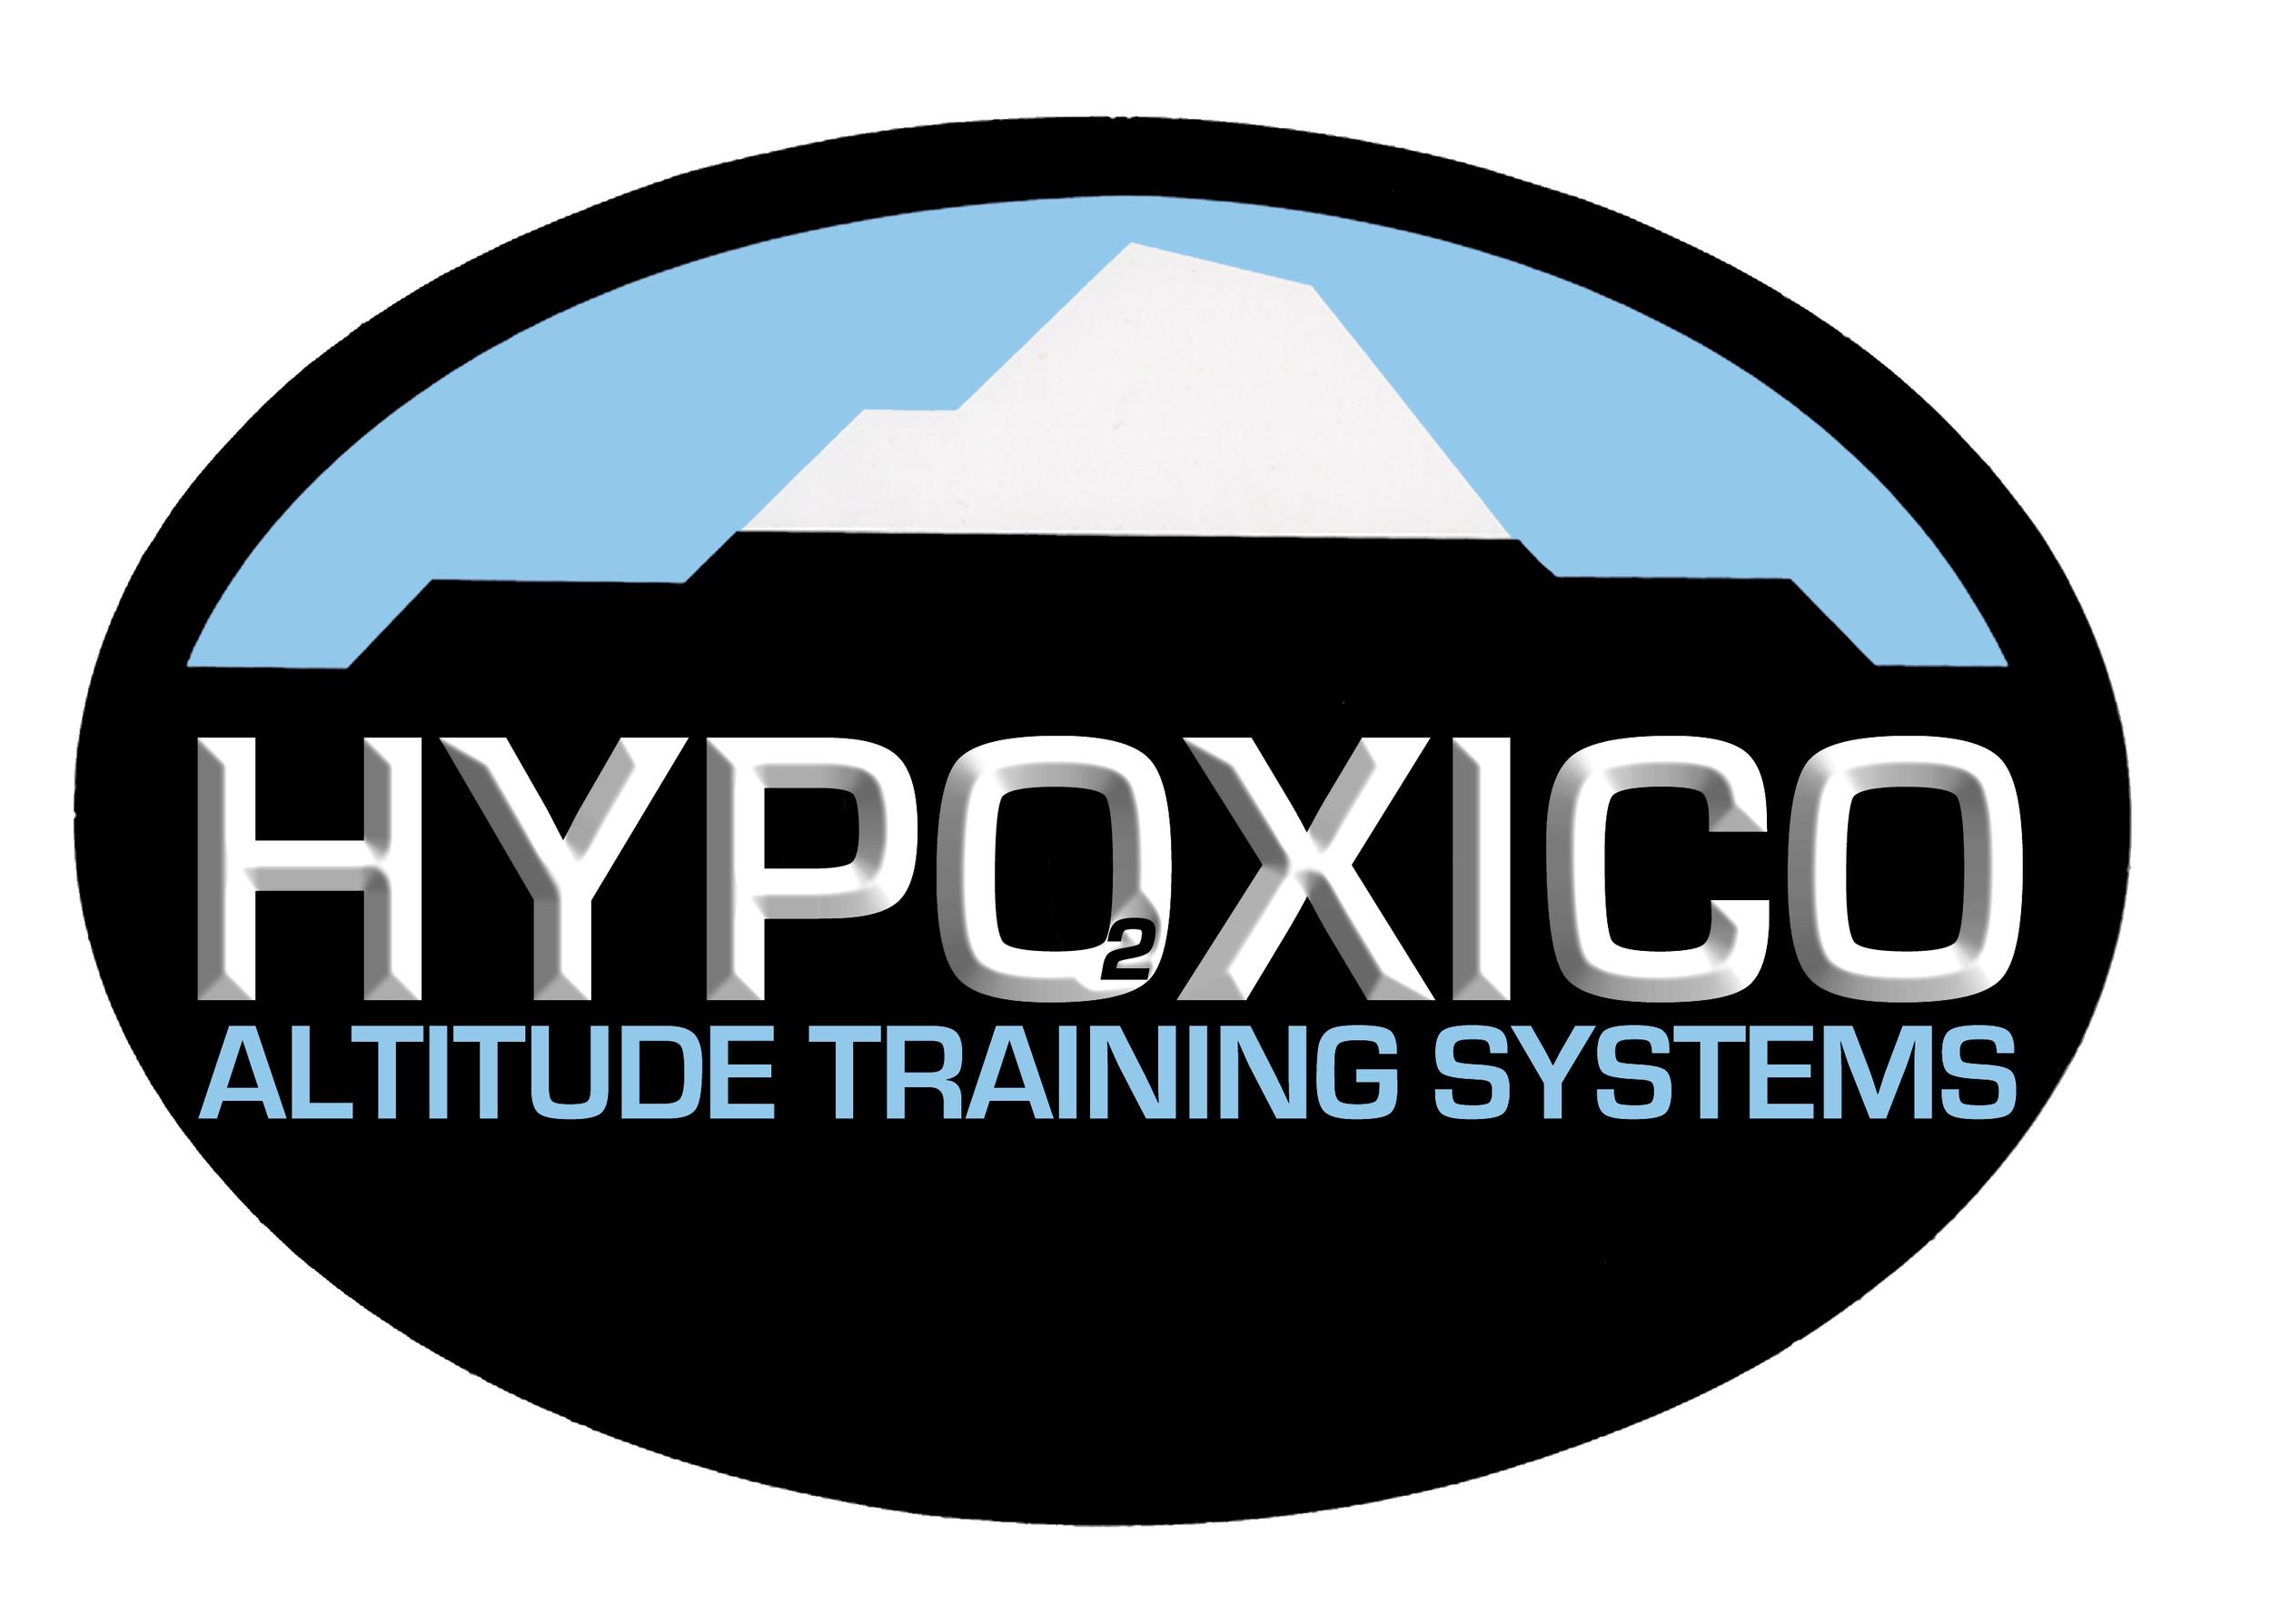 hypoxico_logo.jpg